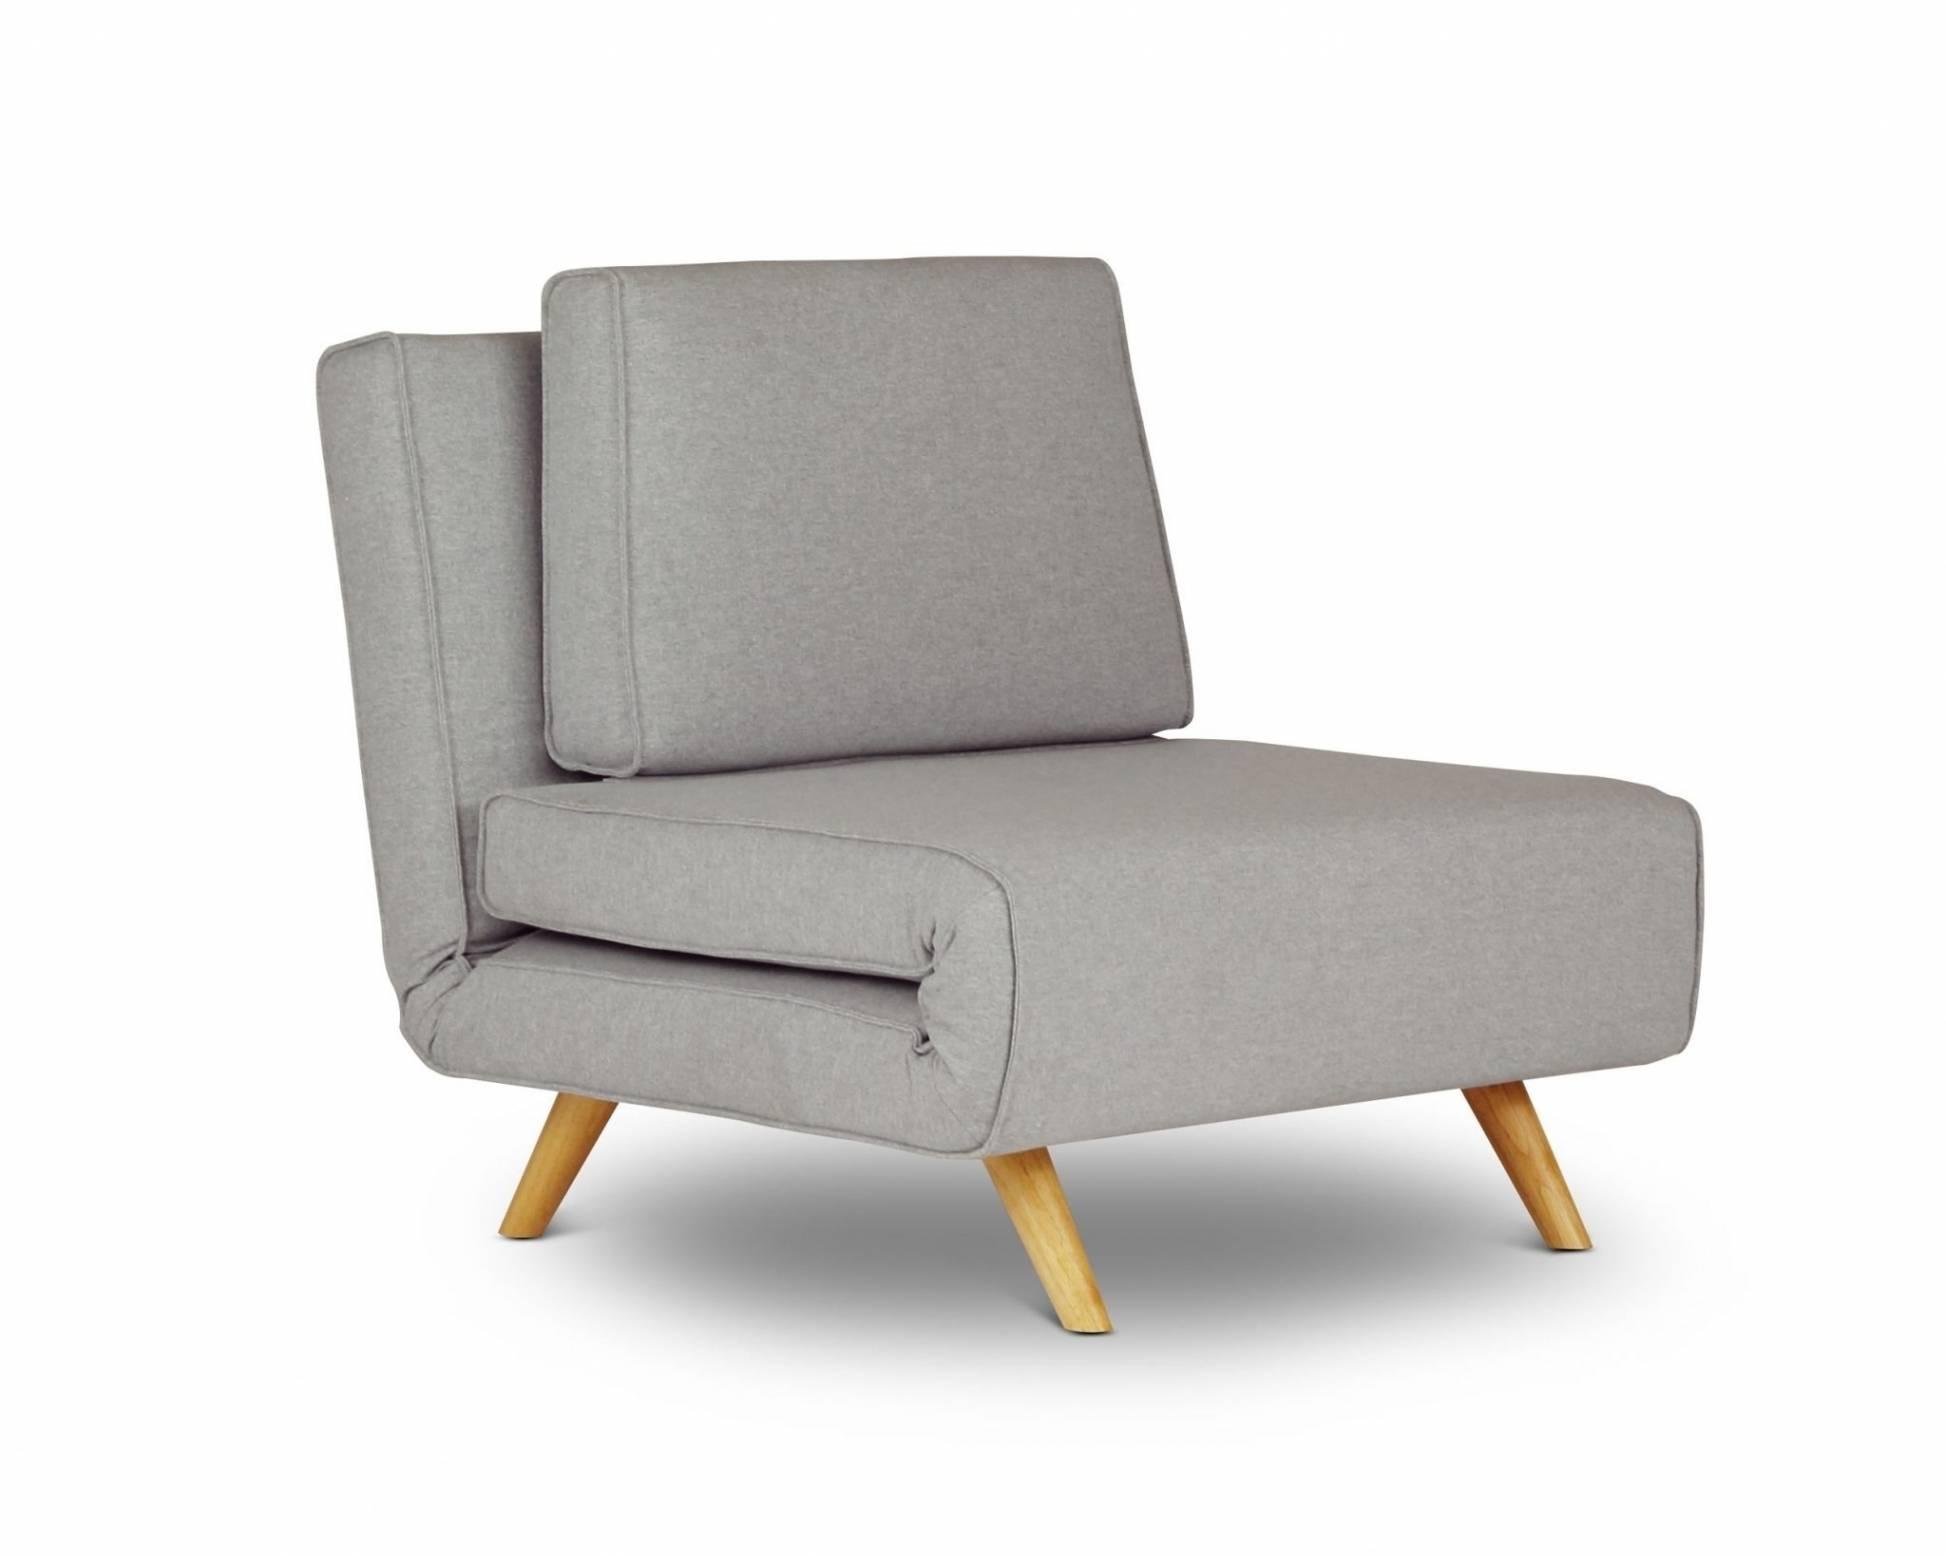 Unique Single Sofa Bed Chair | Sofa Ideas for Single Sofa Beds (Image 24 of 30)